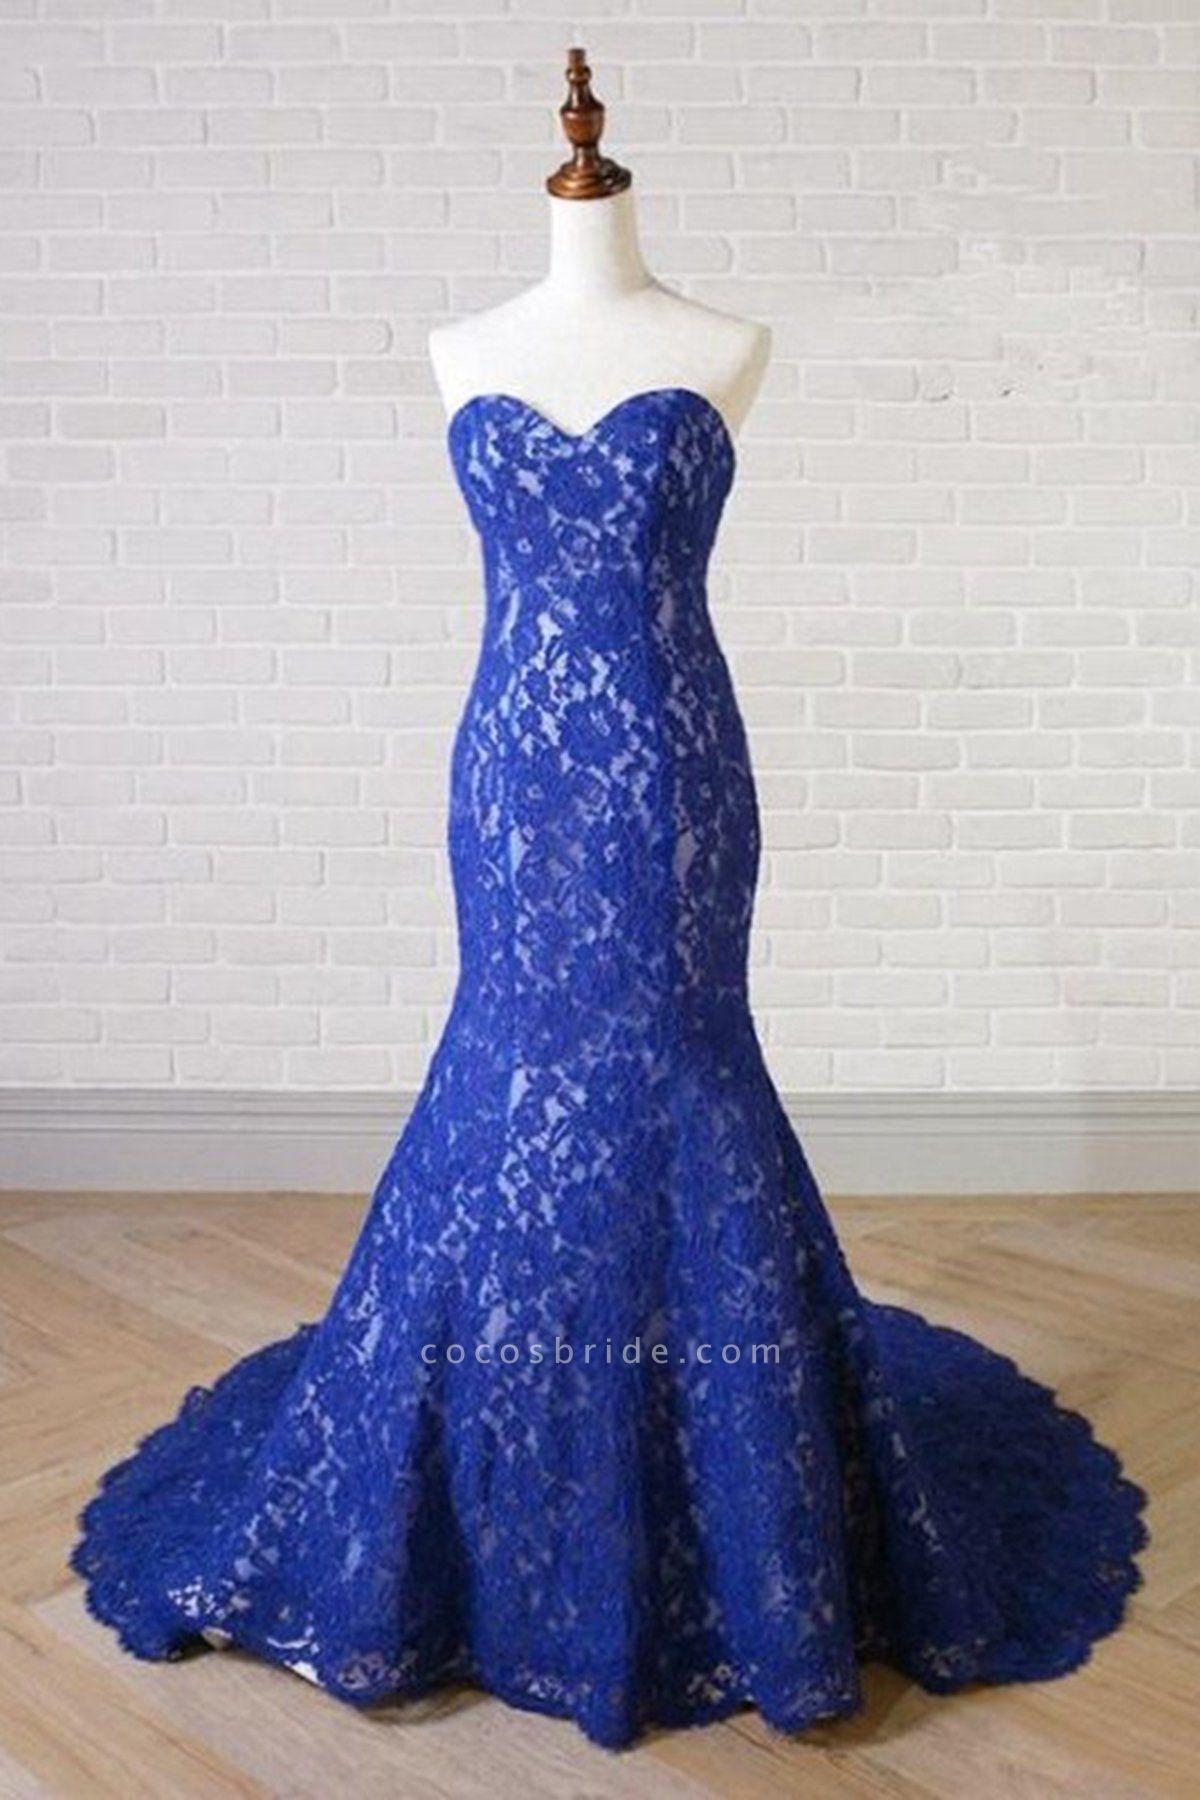 Sweetheart Neck Royal Blue Lace Long Mermaid Prom Dress